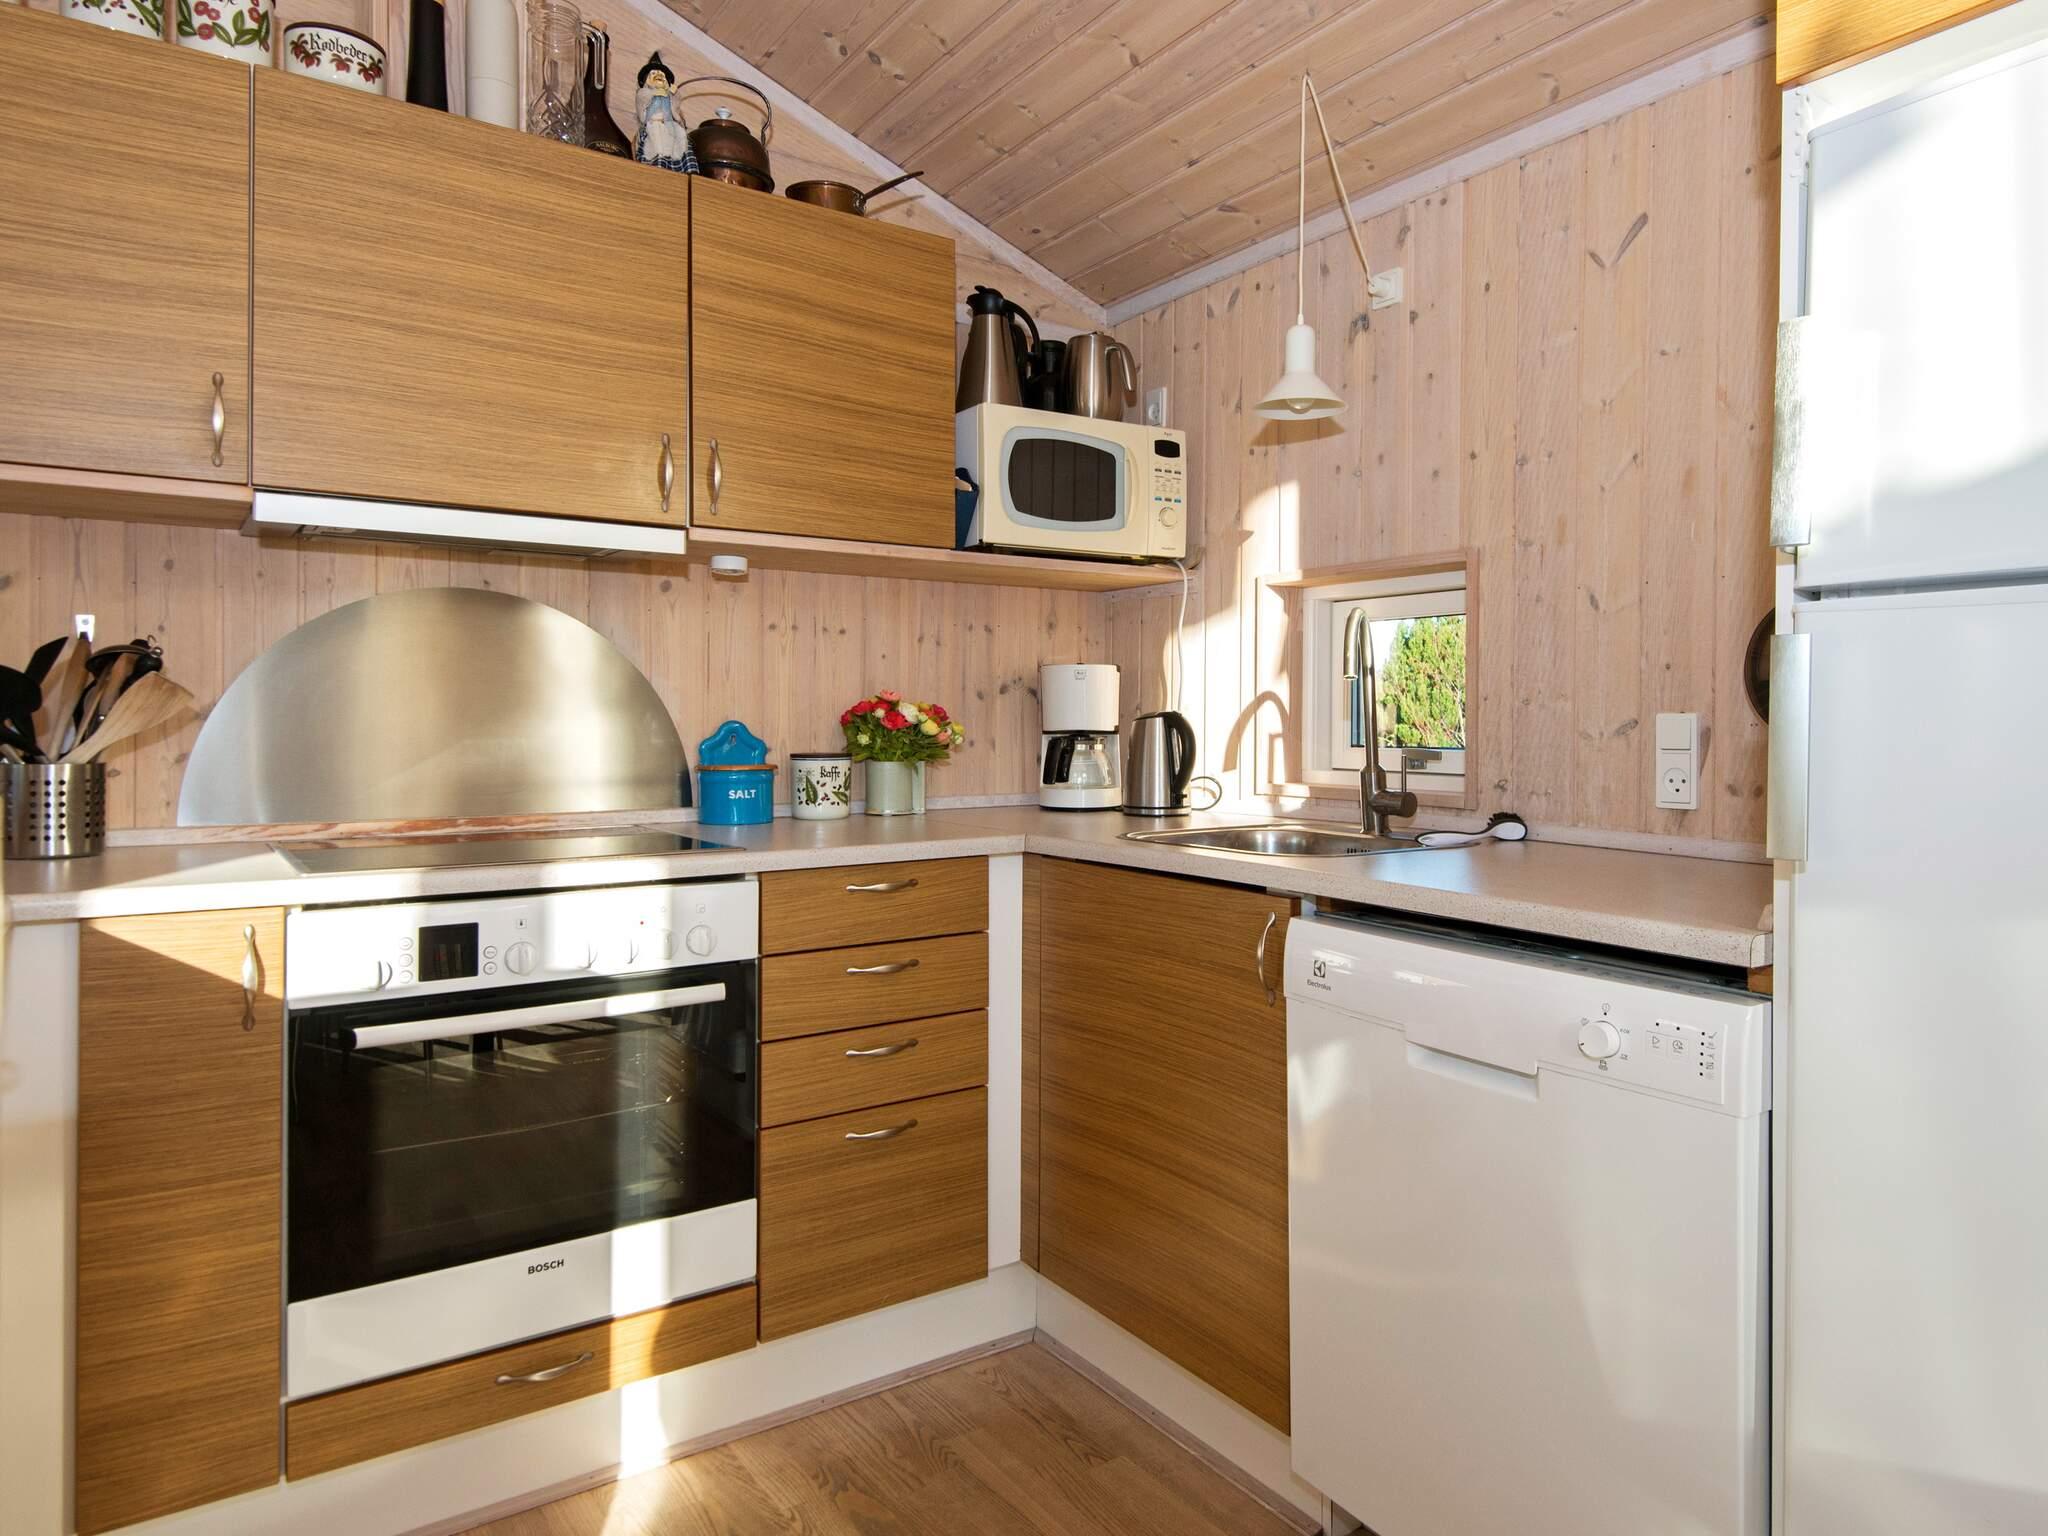 Maison de vacances Helgenæs (681779), Knebel, , Mer Baltique danoise, Danemark, image 7